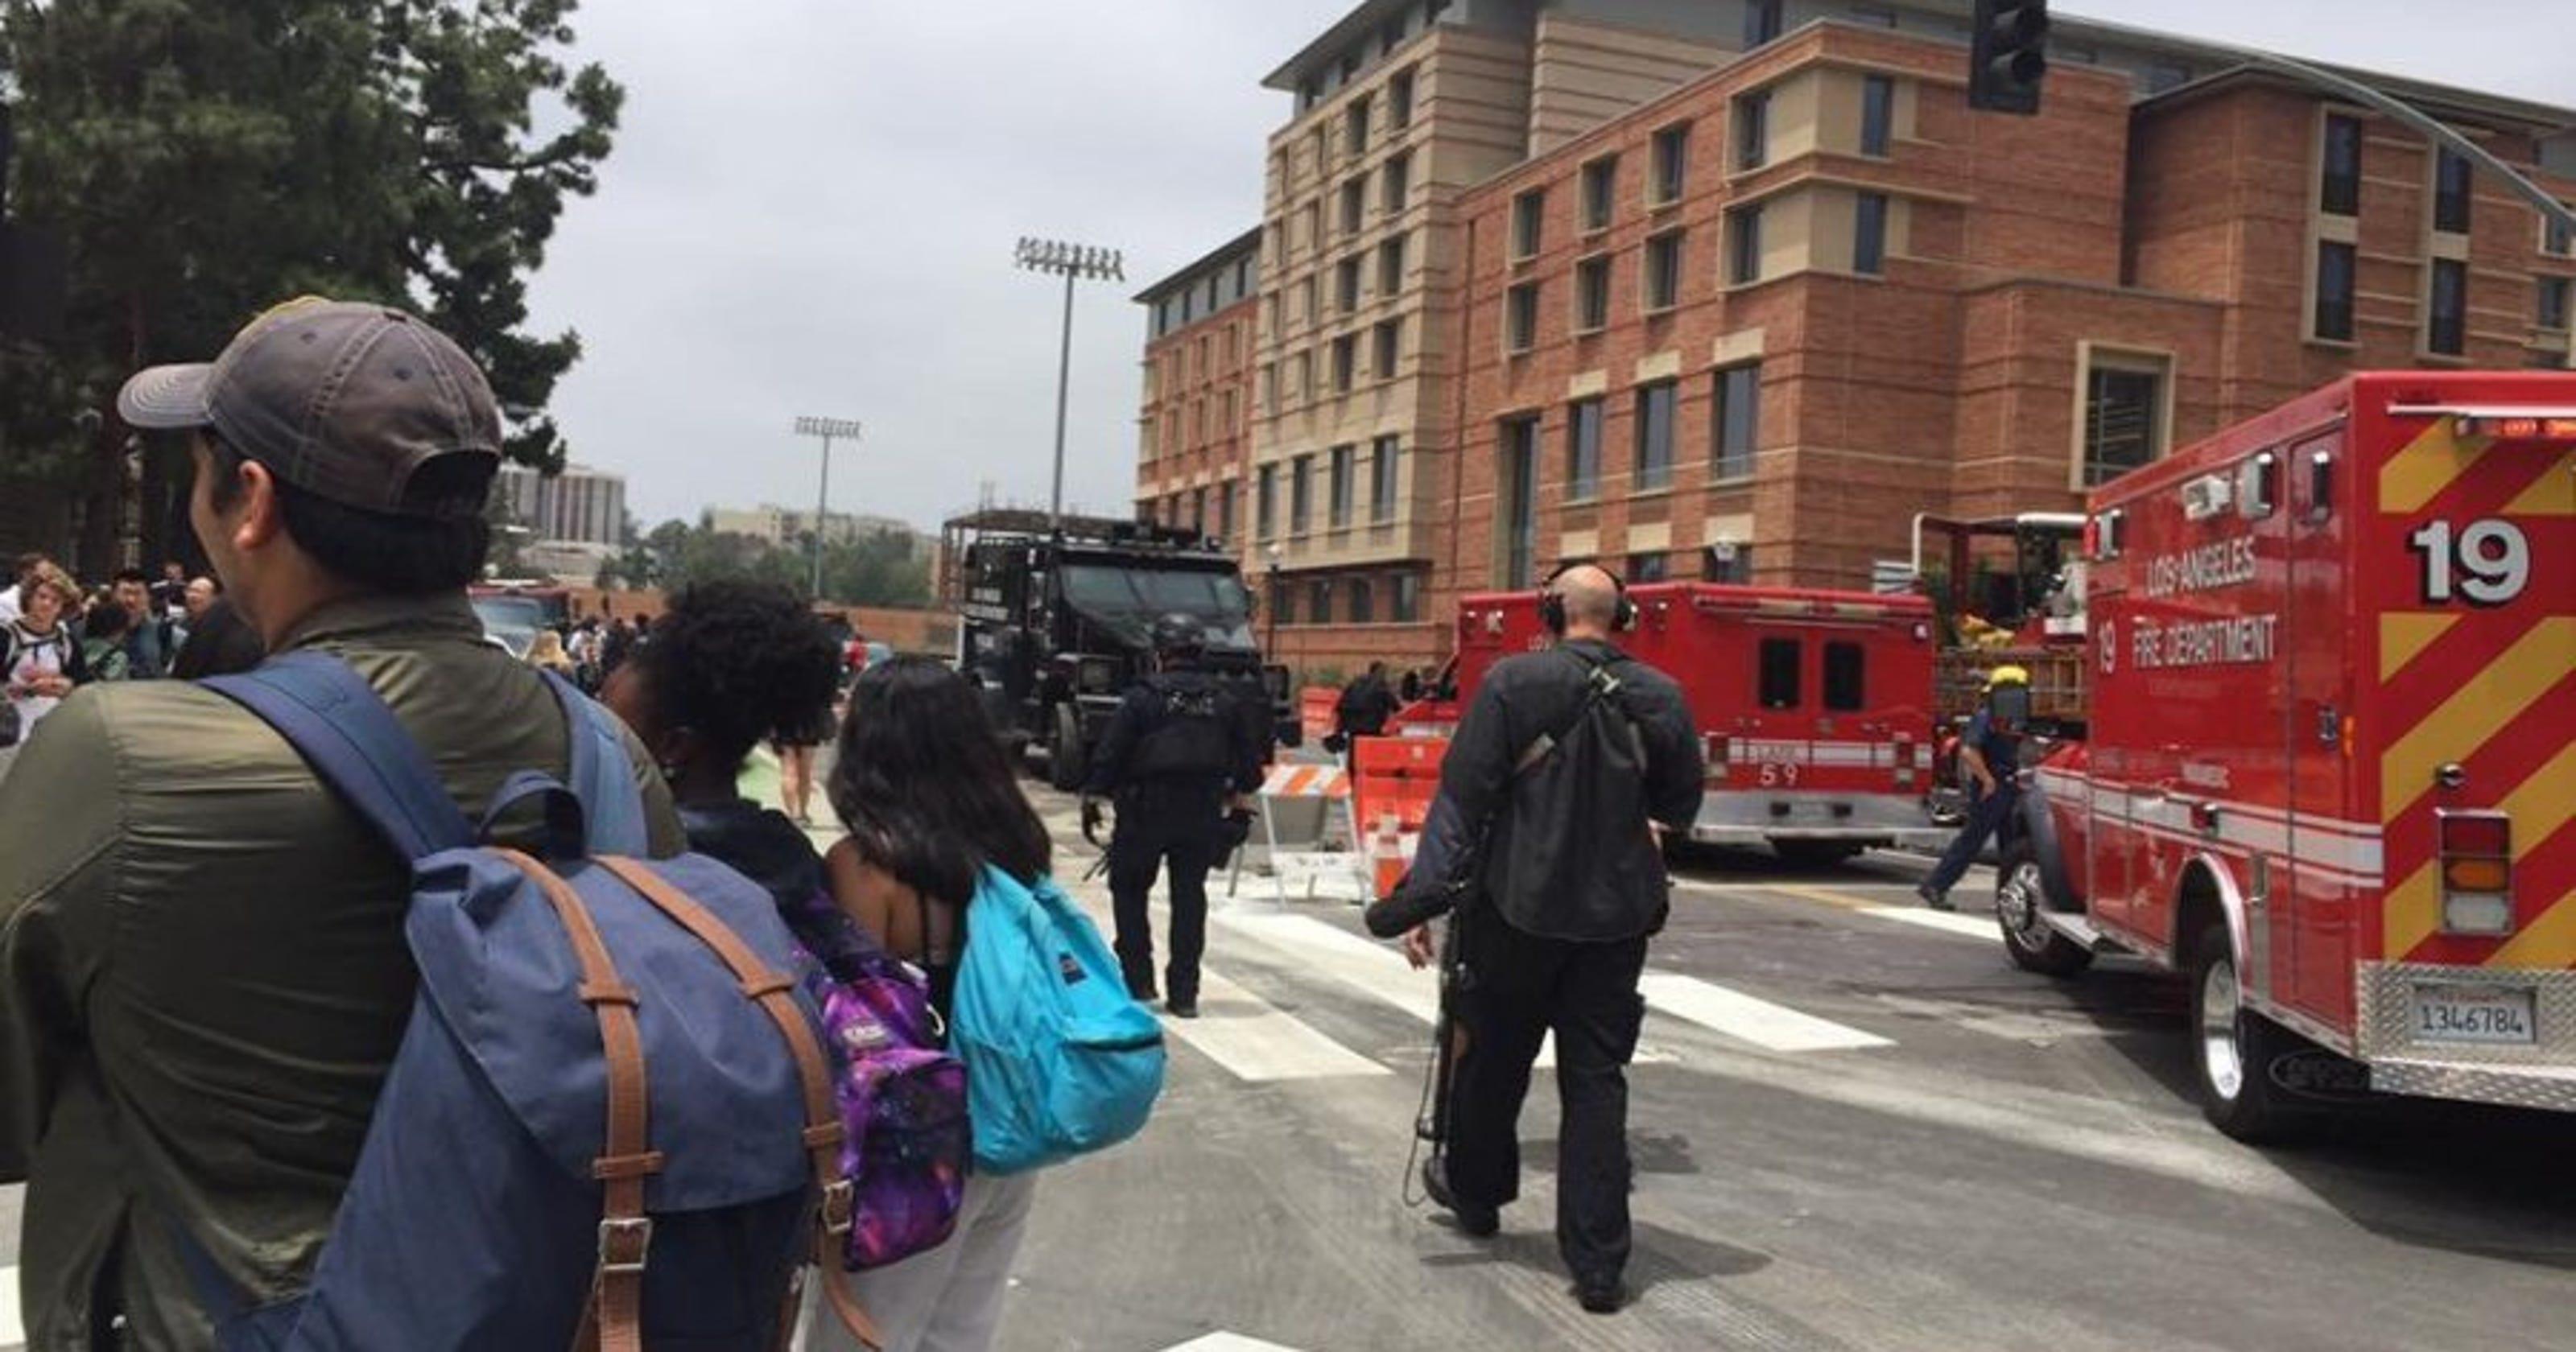 Ventura County locals who study at UCLA say lockdown